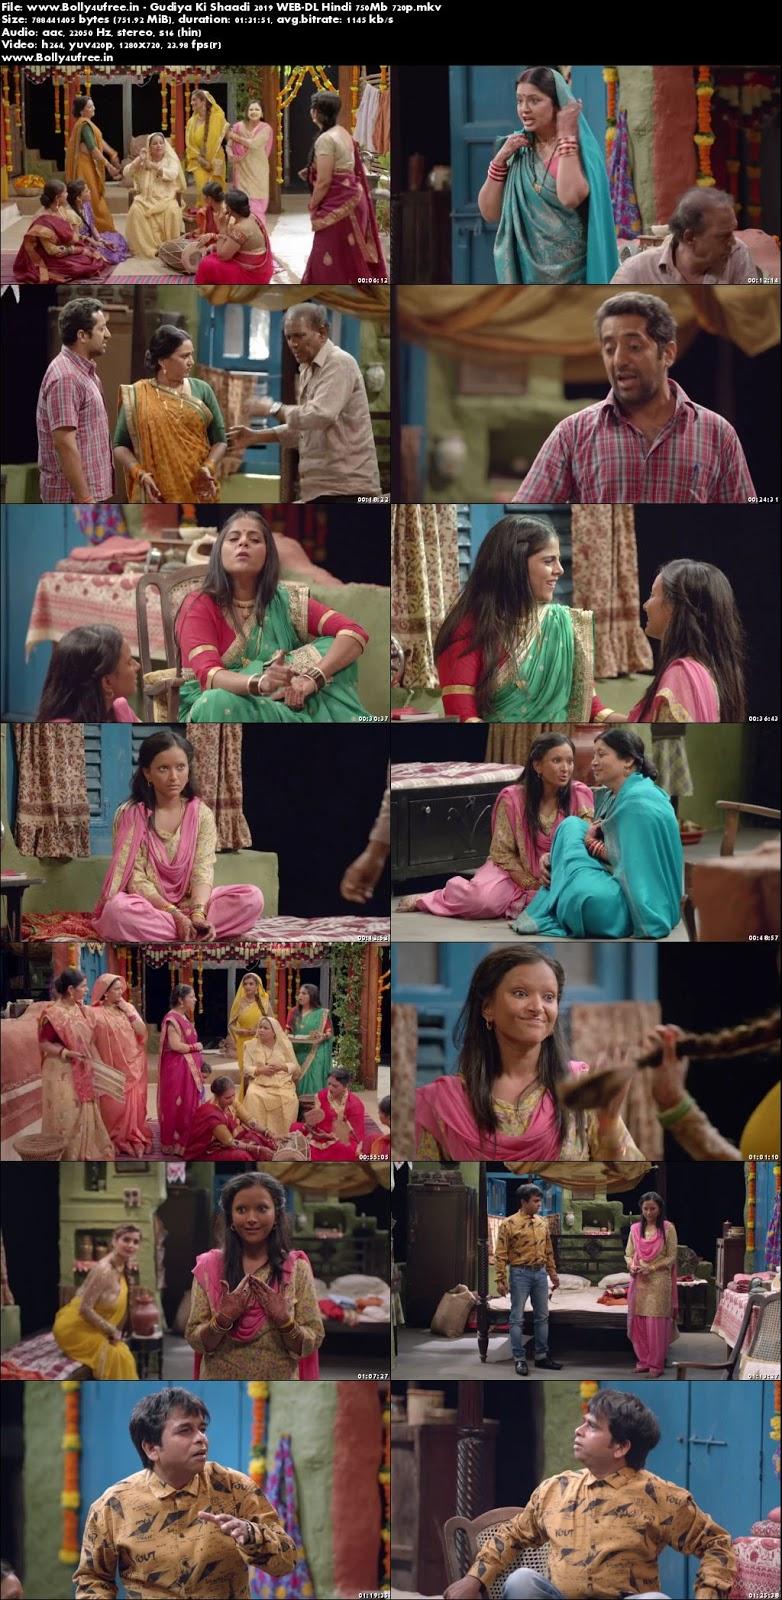 Gudiya Ki Shaadi 2019 Hindi Movie Download 300MB 480p WEB-DL